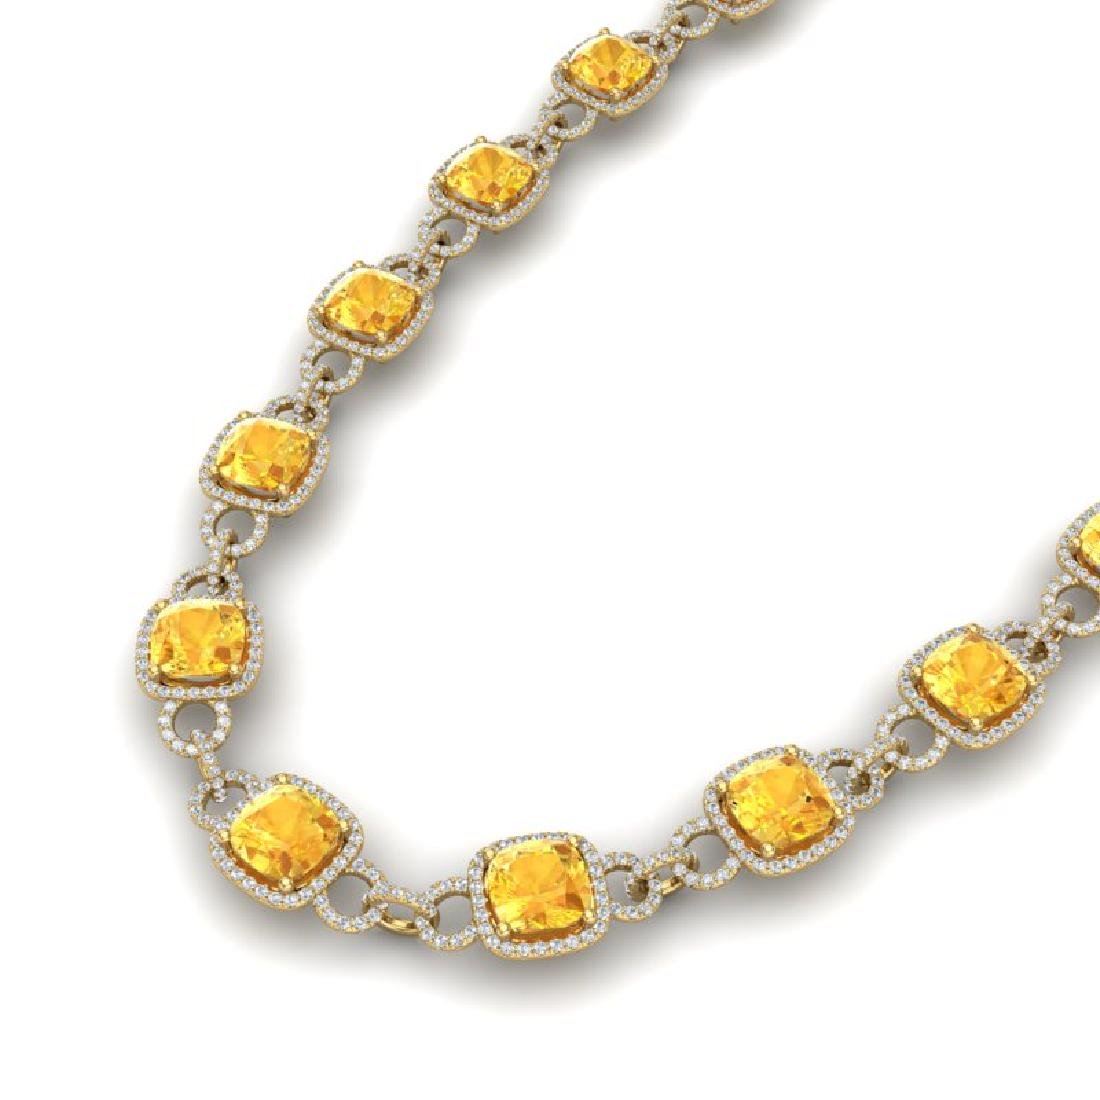 66 CTW Citrine & VS/SI Diamond Necklace 14K Yellow Gold